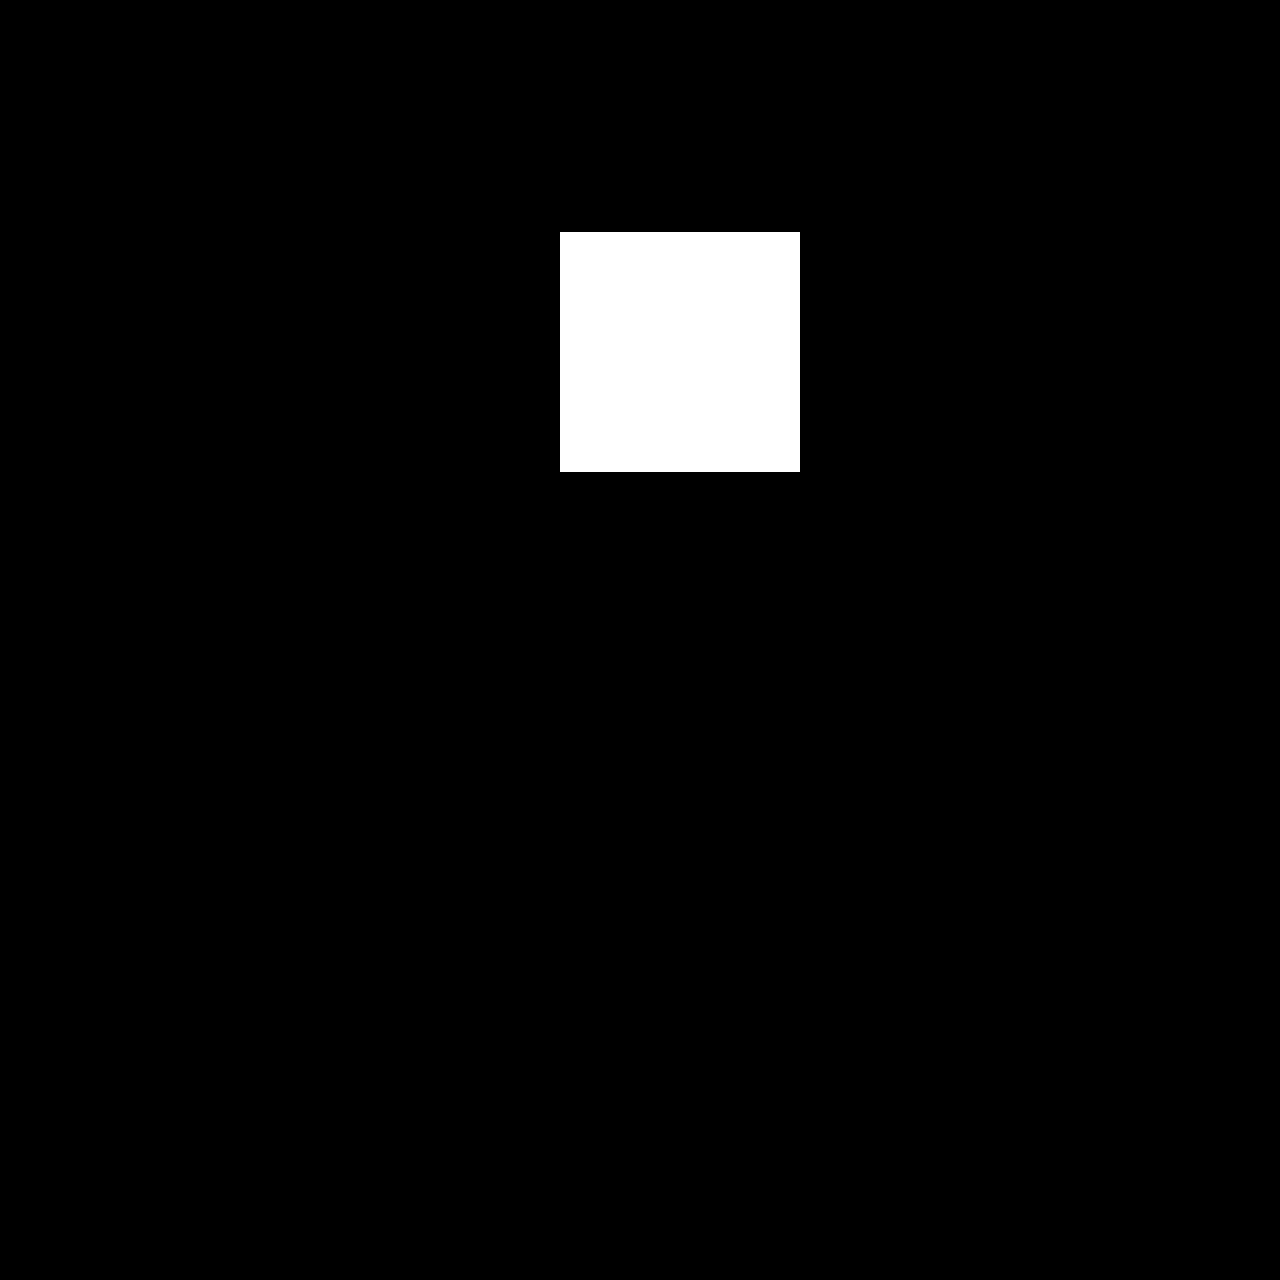 Square (model)